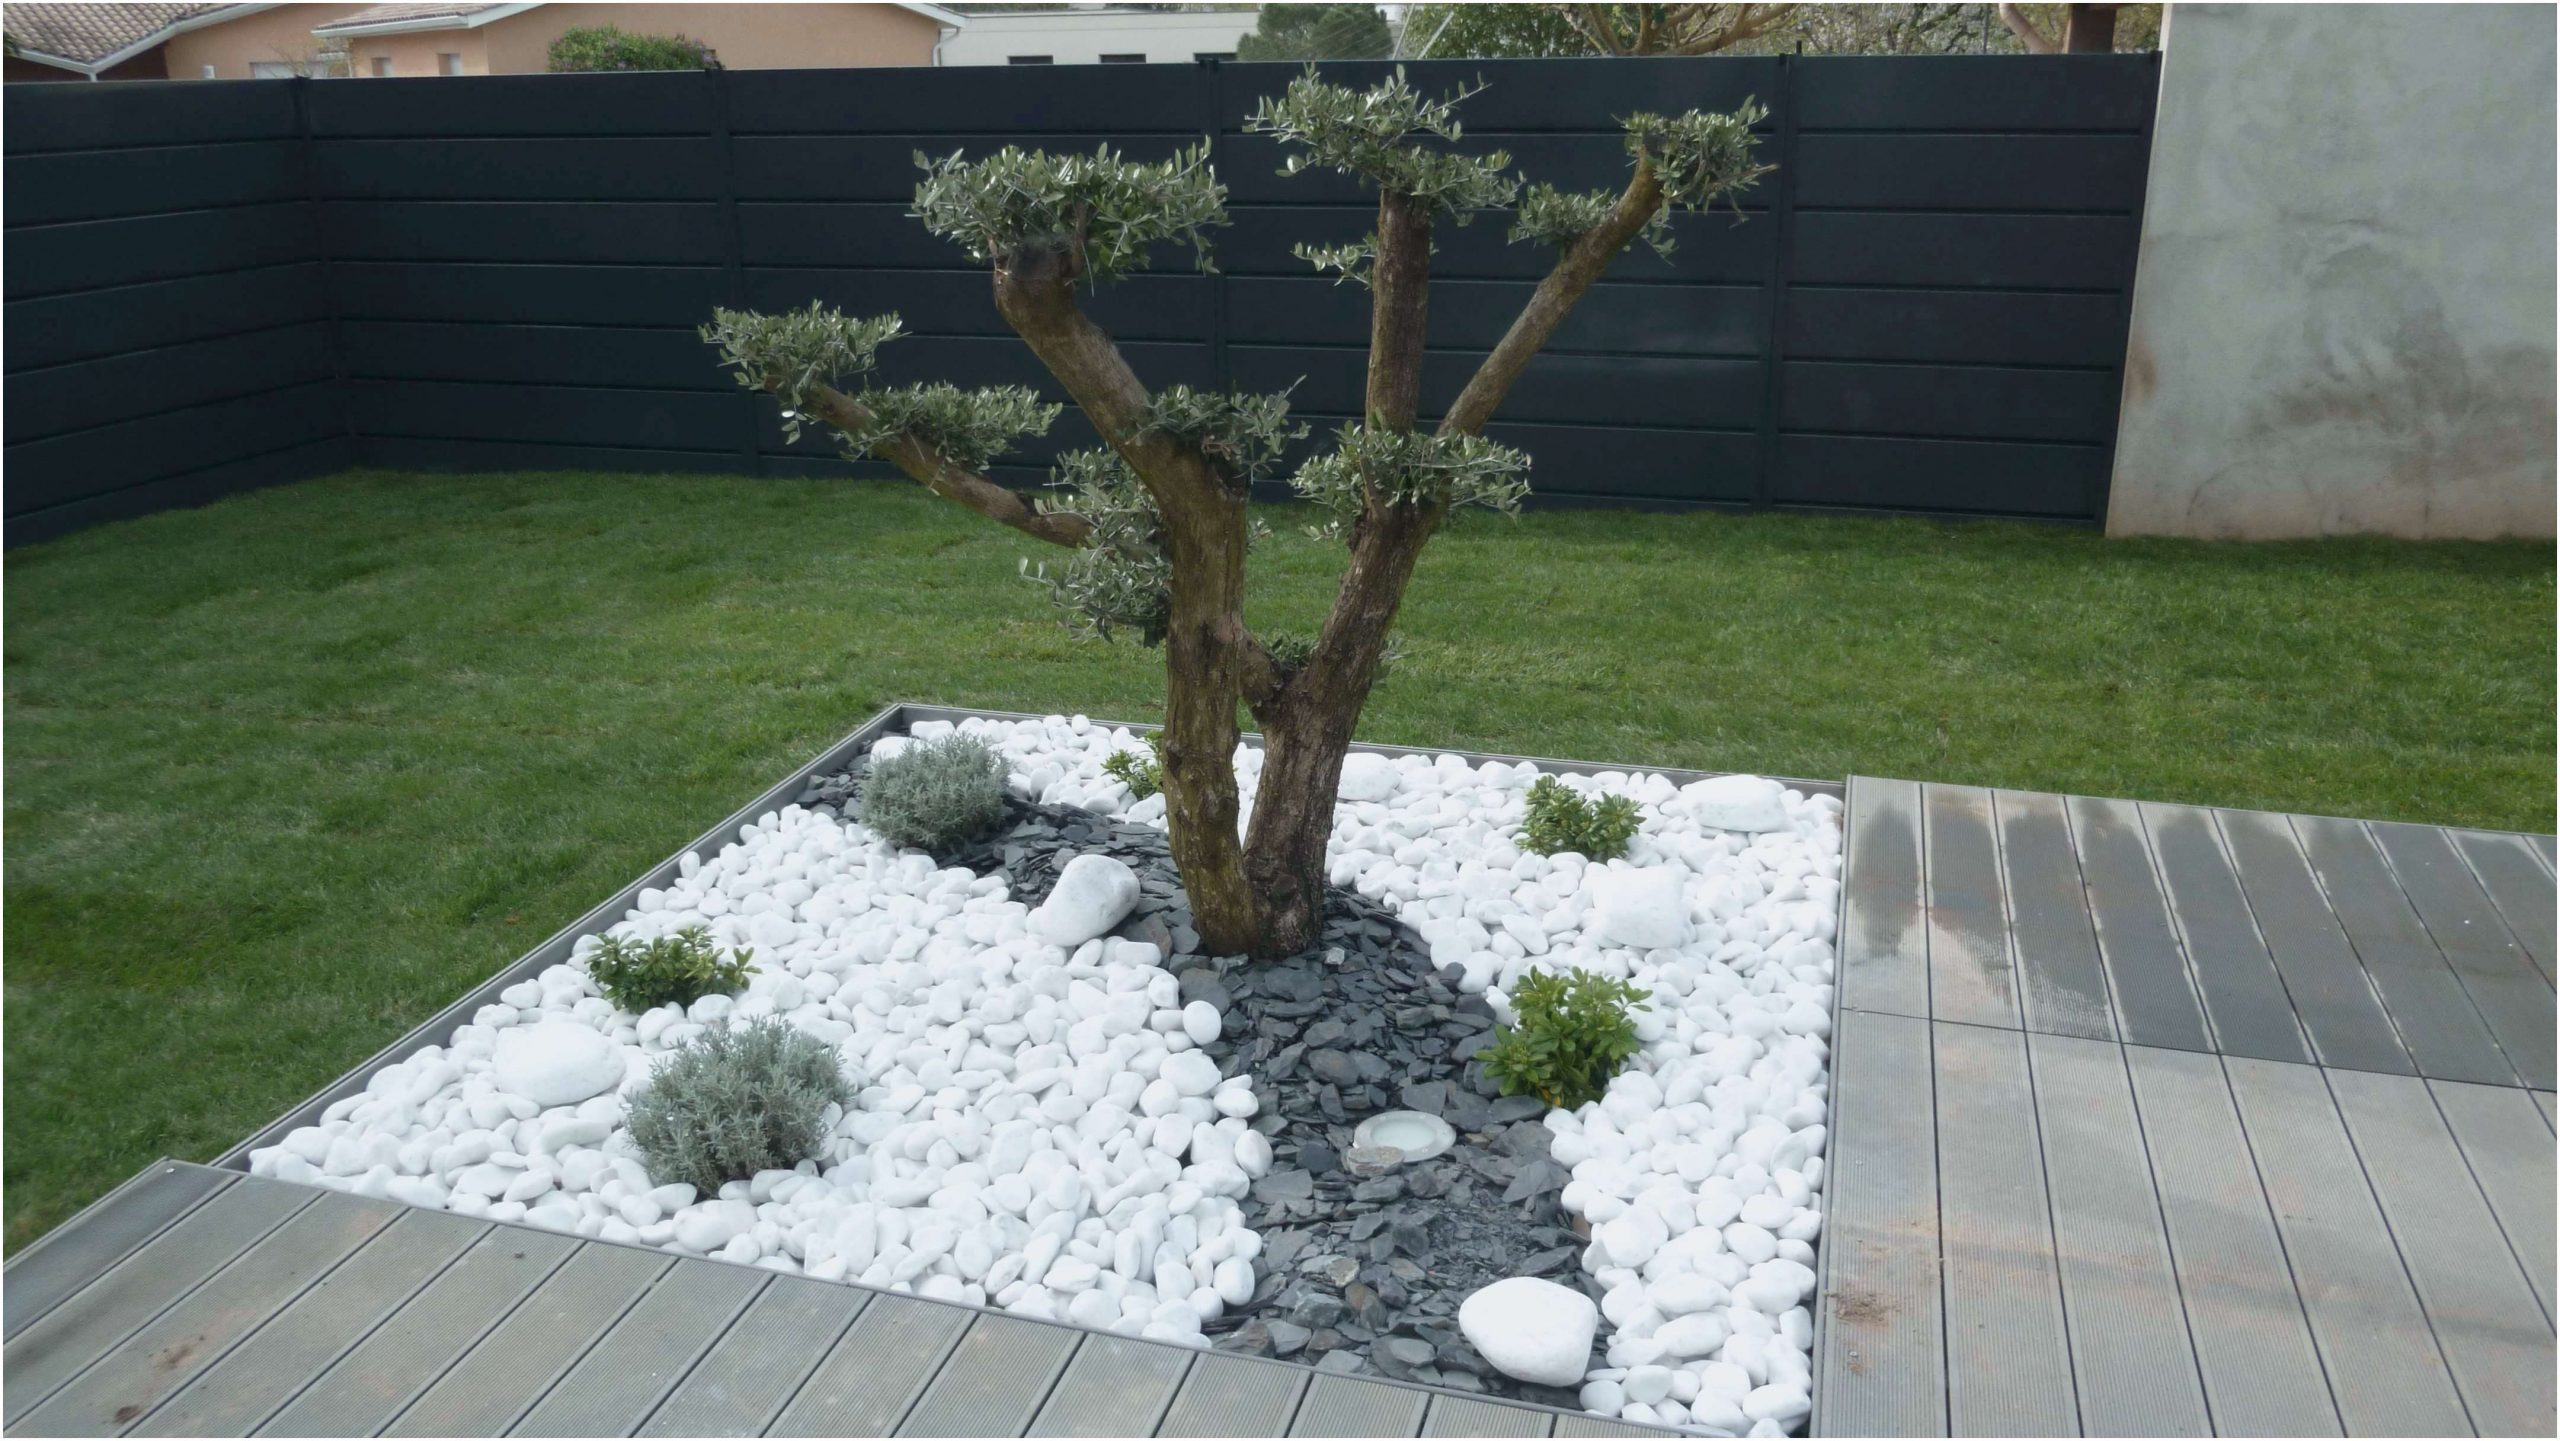 Idee Deco Jardin Avec Gravillon | Aménagement Jardin ... encequiconcerne Idee Deco Jardin Avec Ardoise